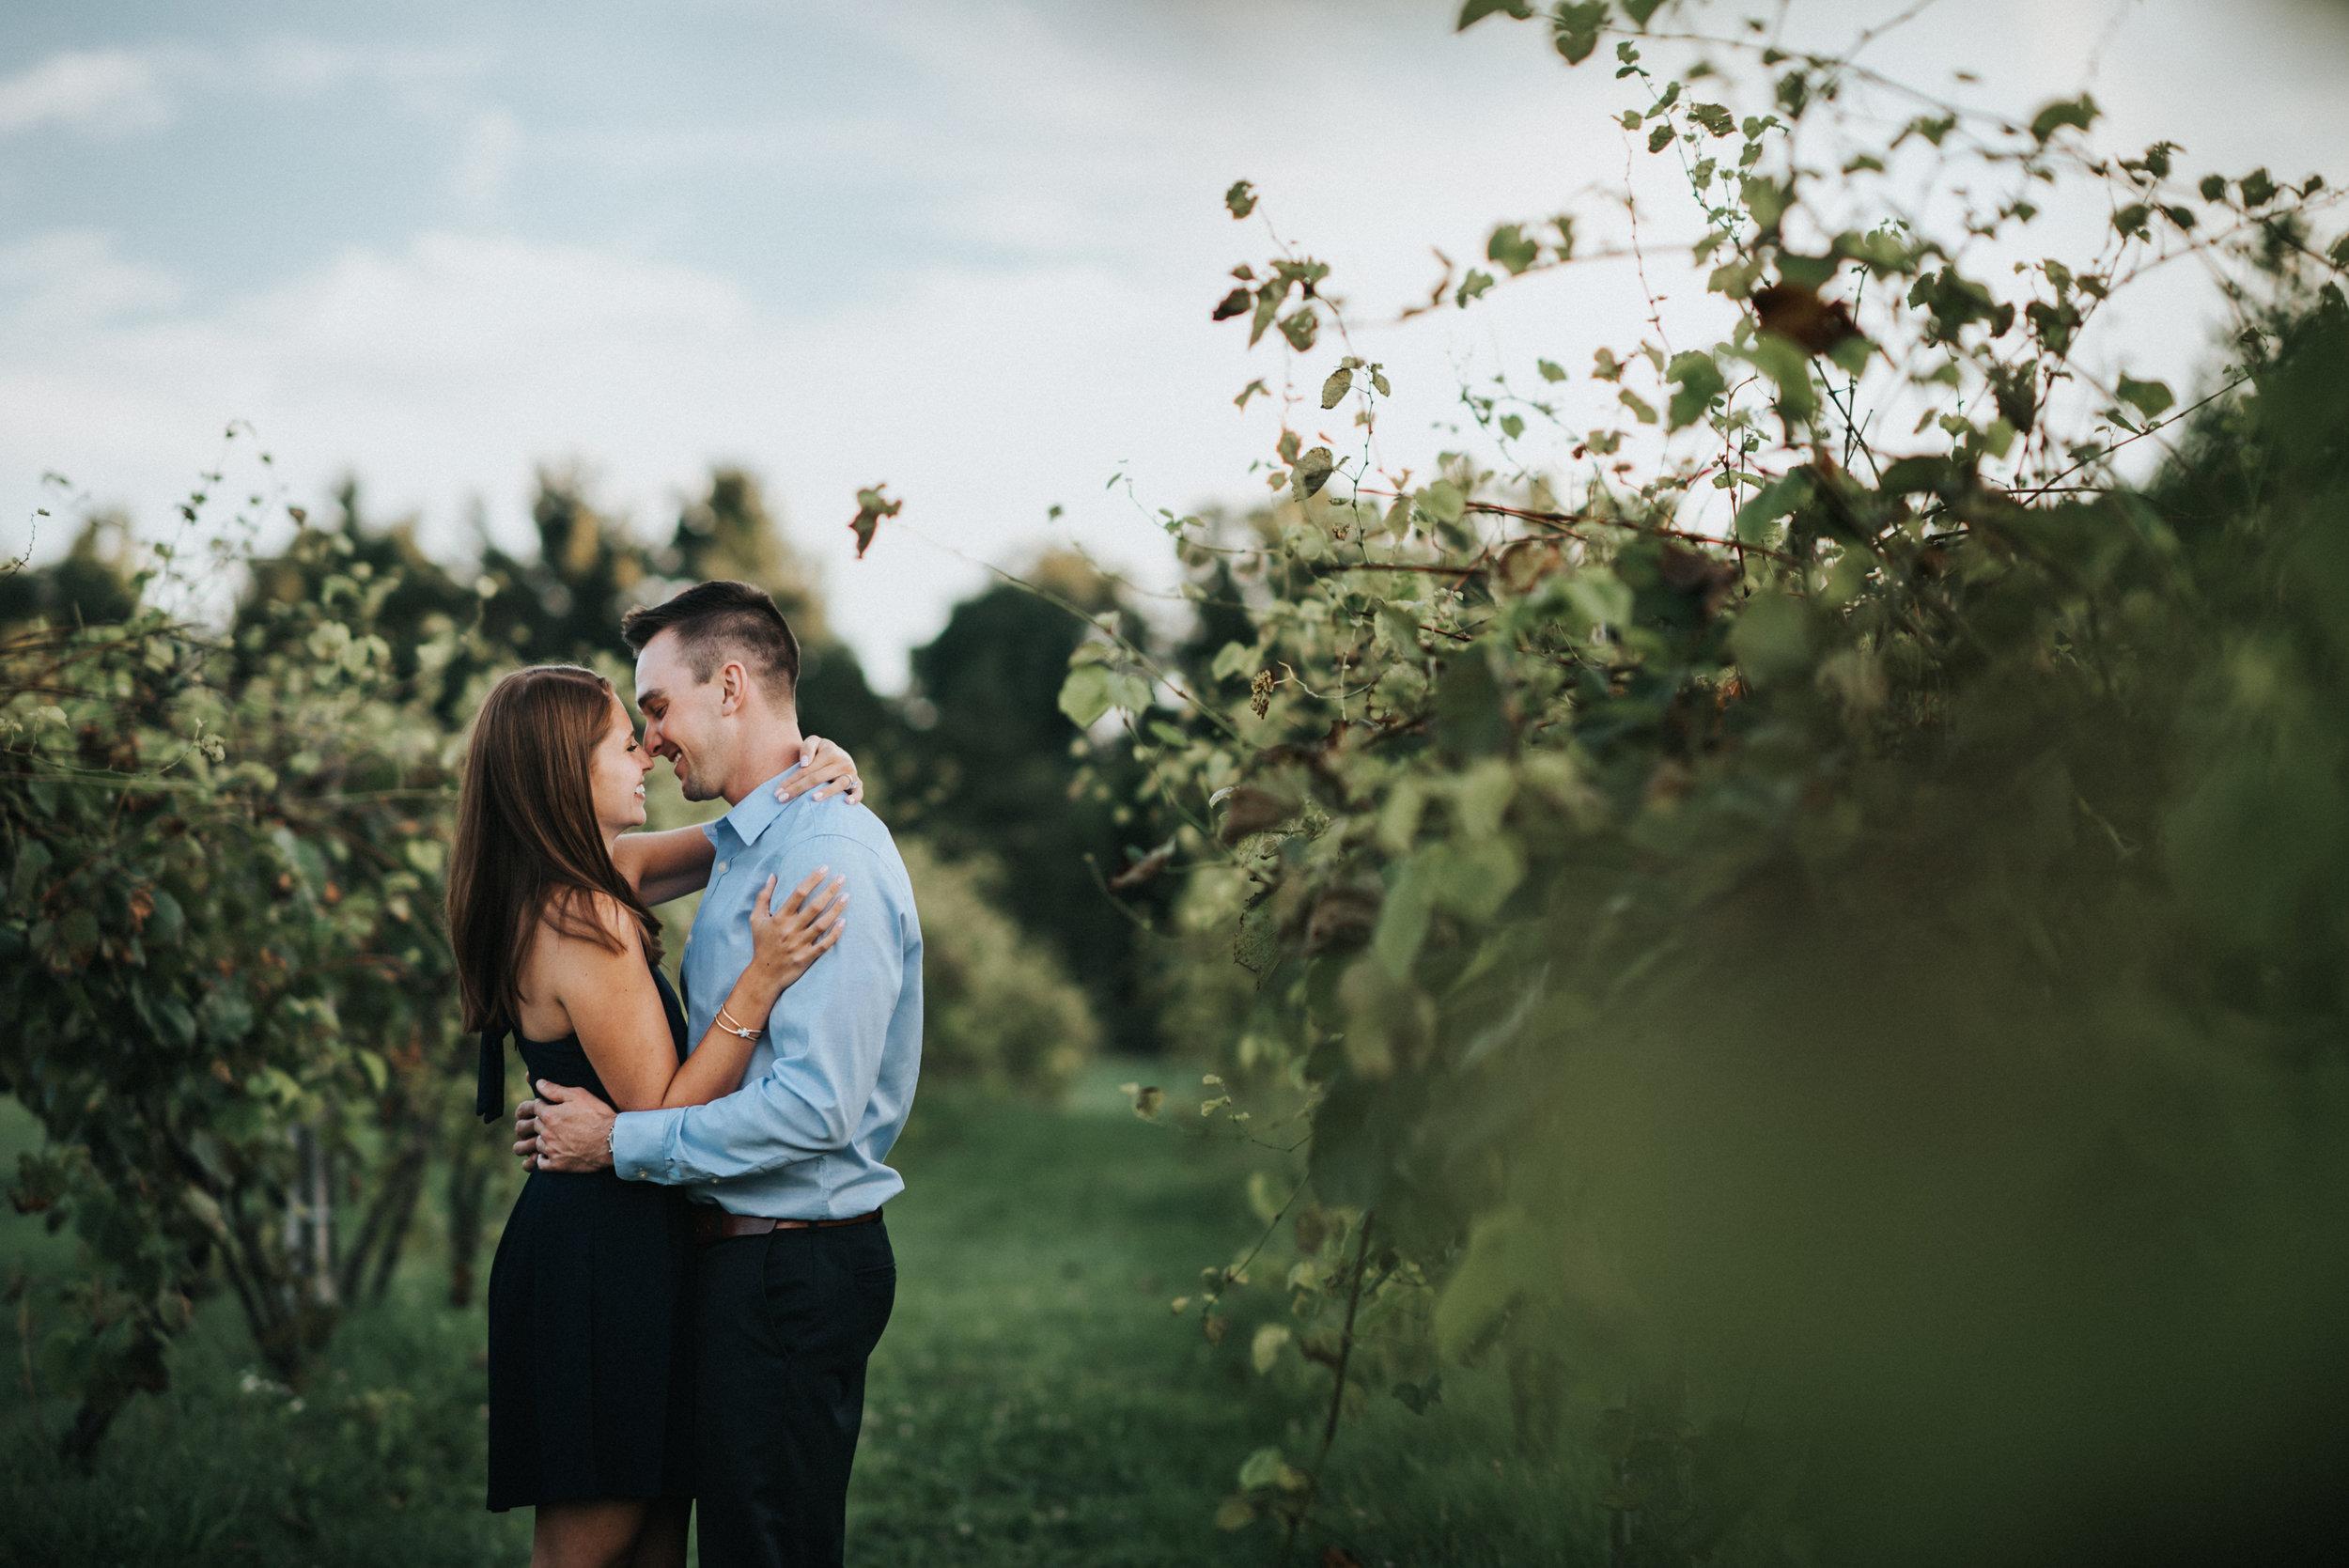 Engagement at Sarah's Vineyard in Cuyahoga Falls Ohio | Emily + Ethan